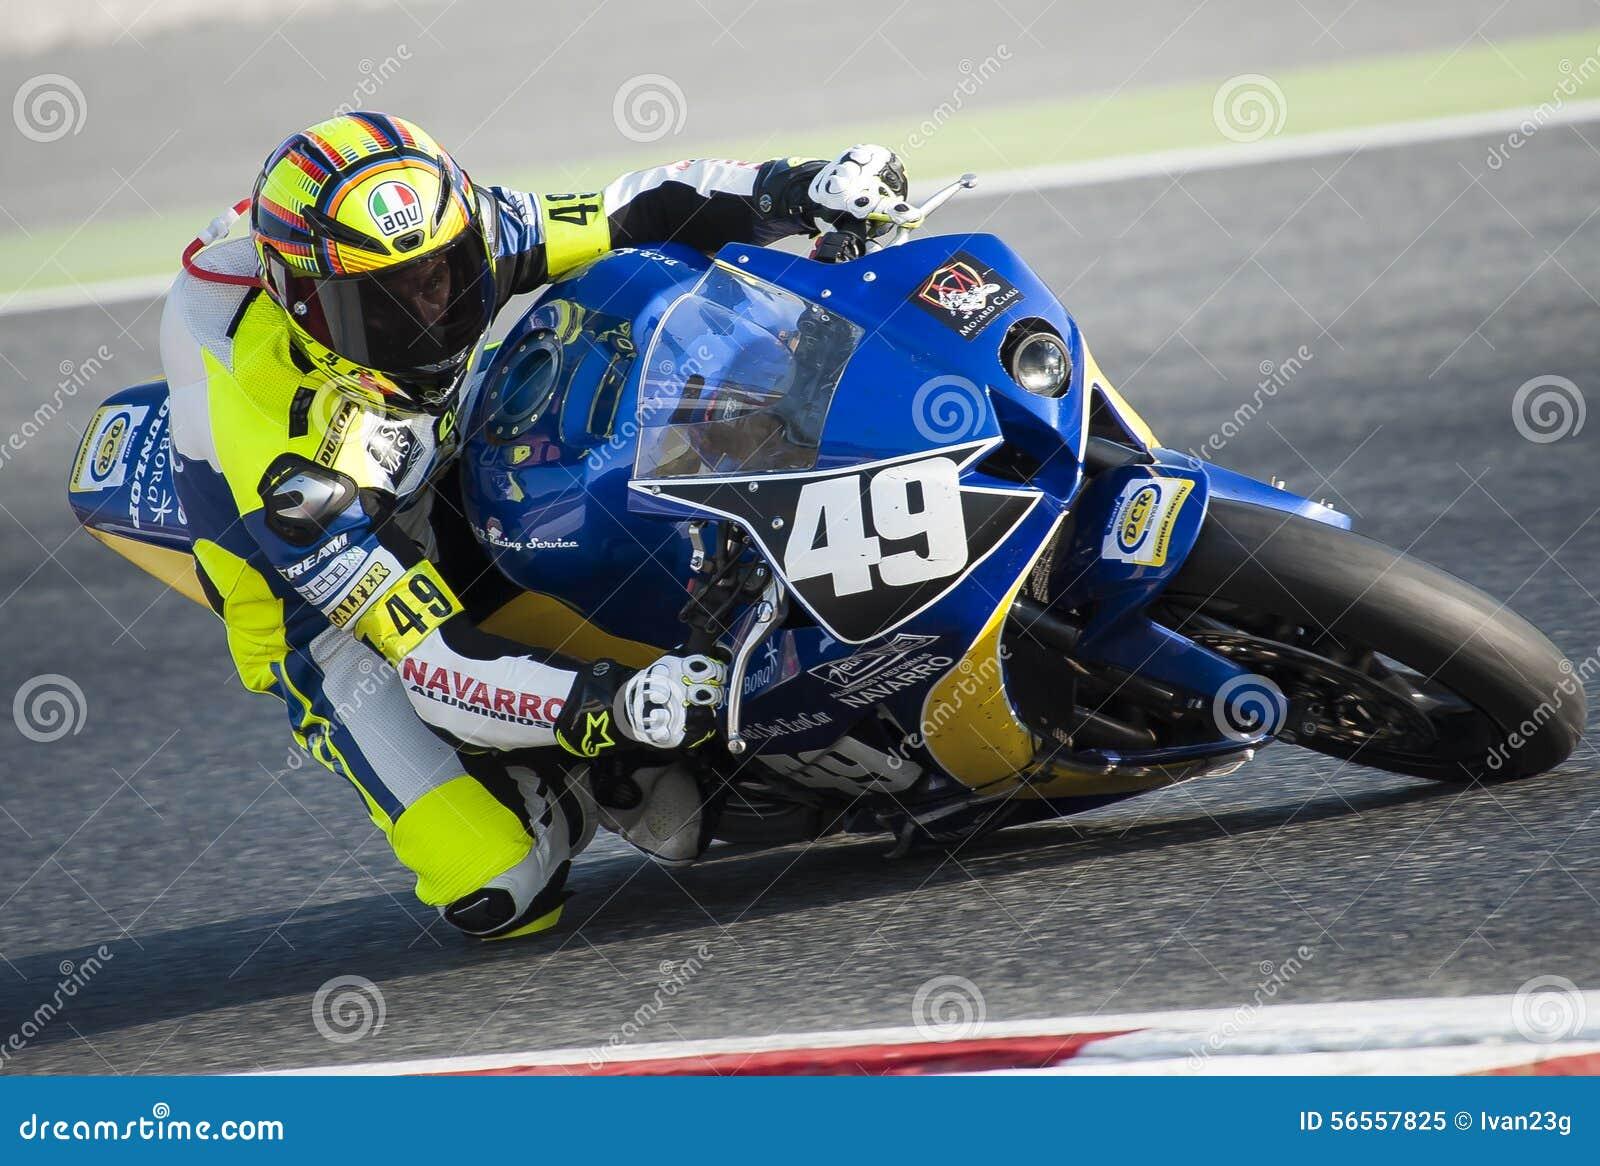 Download 24 ΑΝΤΟΧΗ ΩΡΩΝ MOTORCYCLING ΤΗΣ ΒΑΡΚΕΛΩΝΗΣ Εκδοτική εικόνα - εικόνα από πρωτάθλημα, αθλητισμός: 56557825